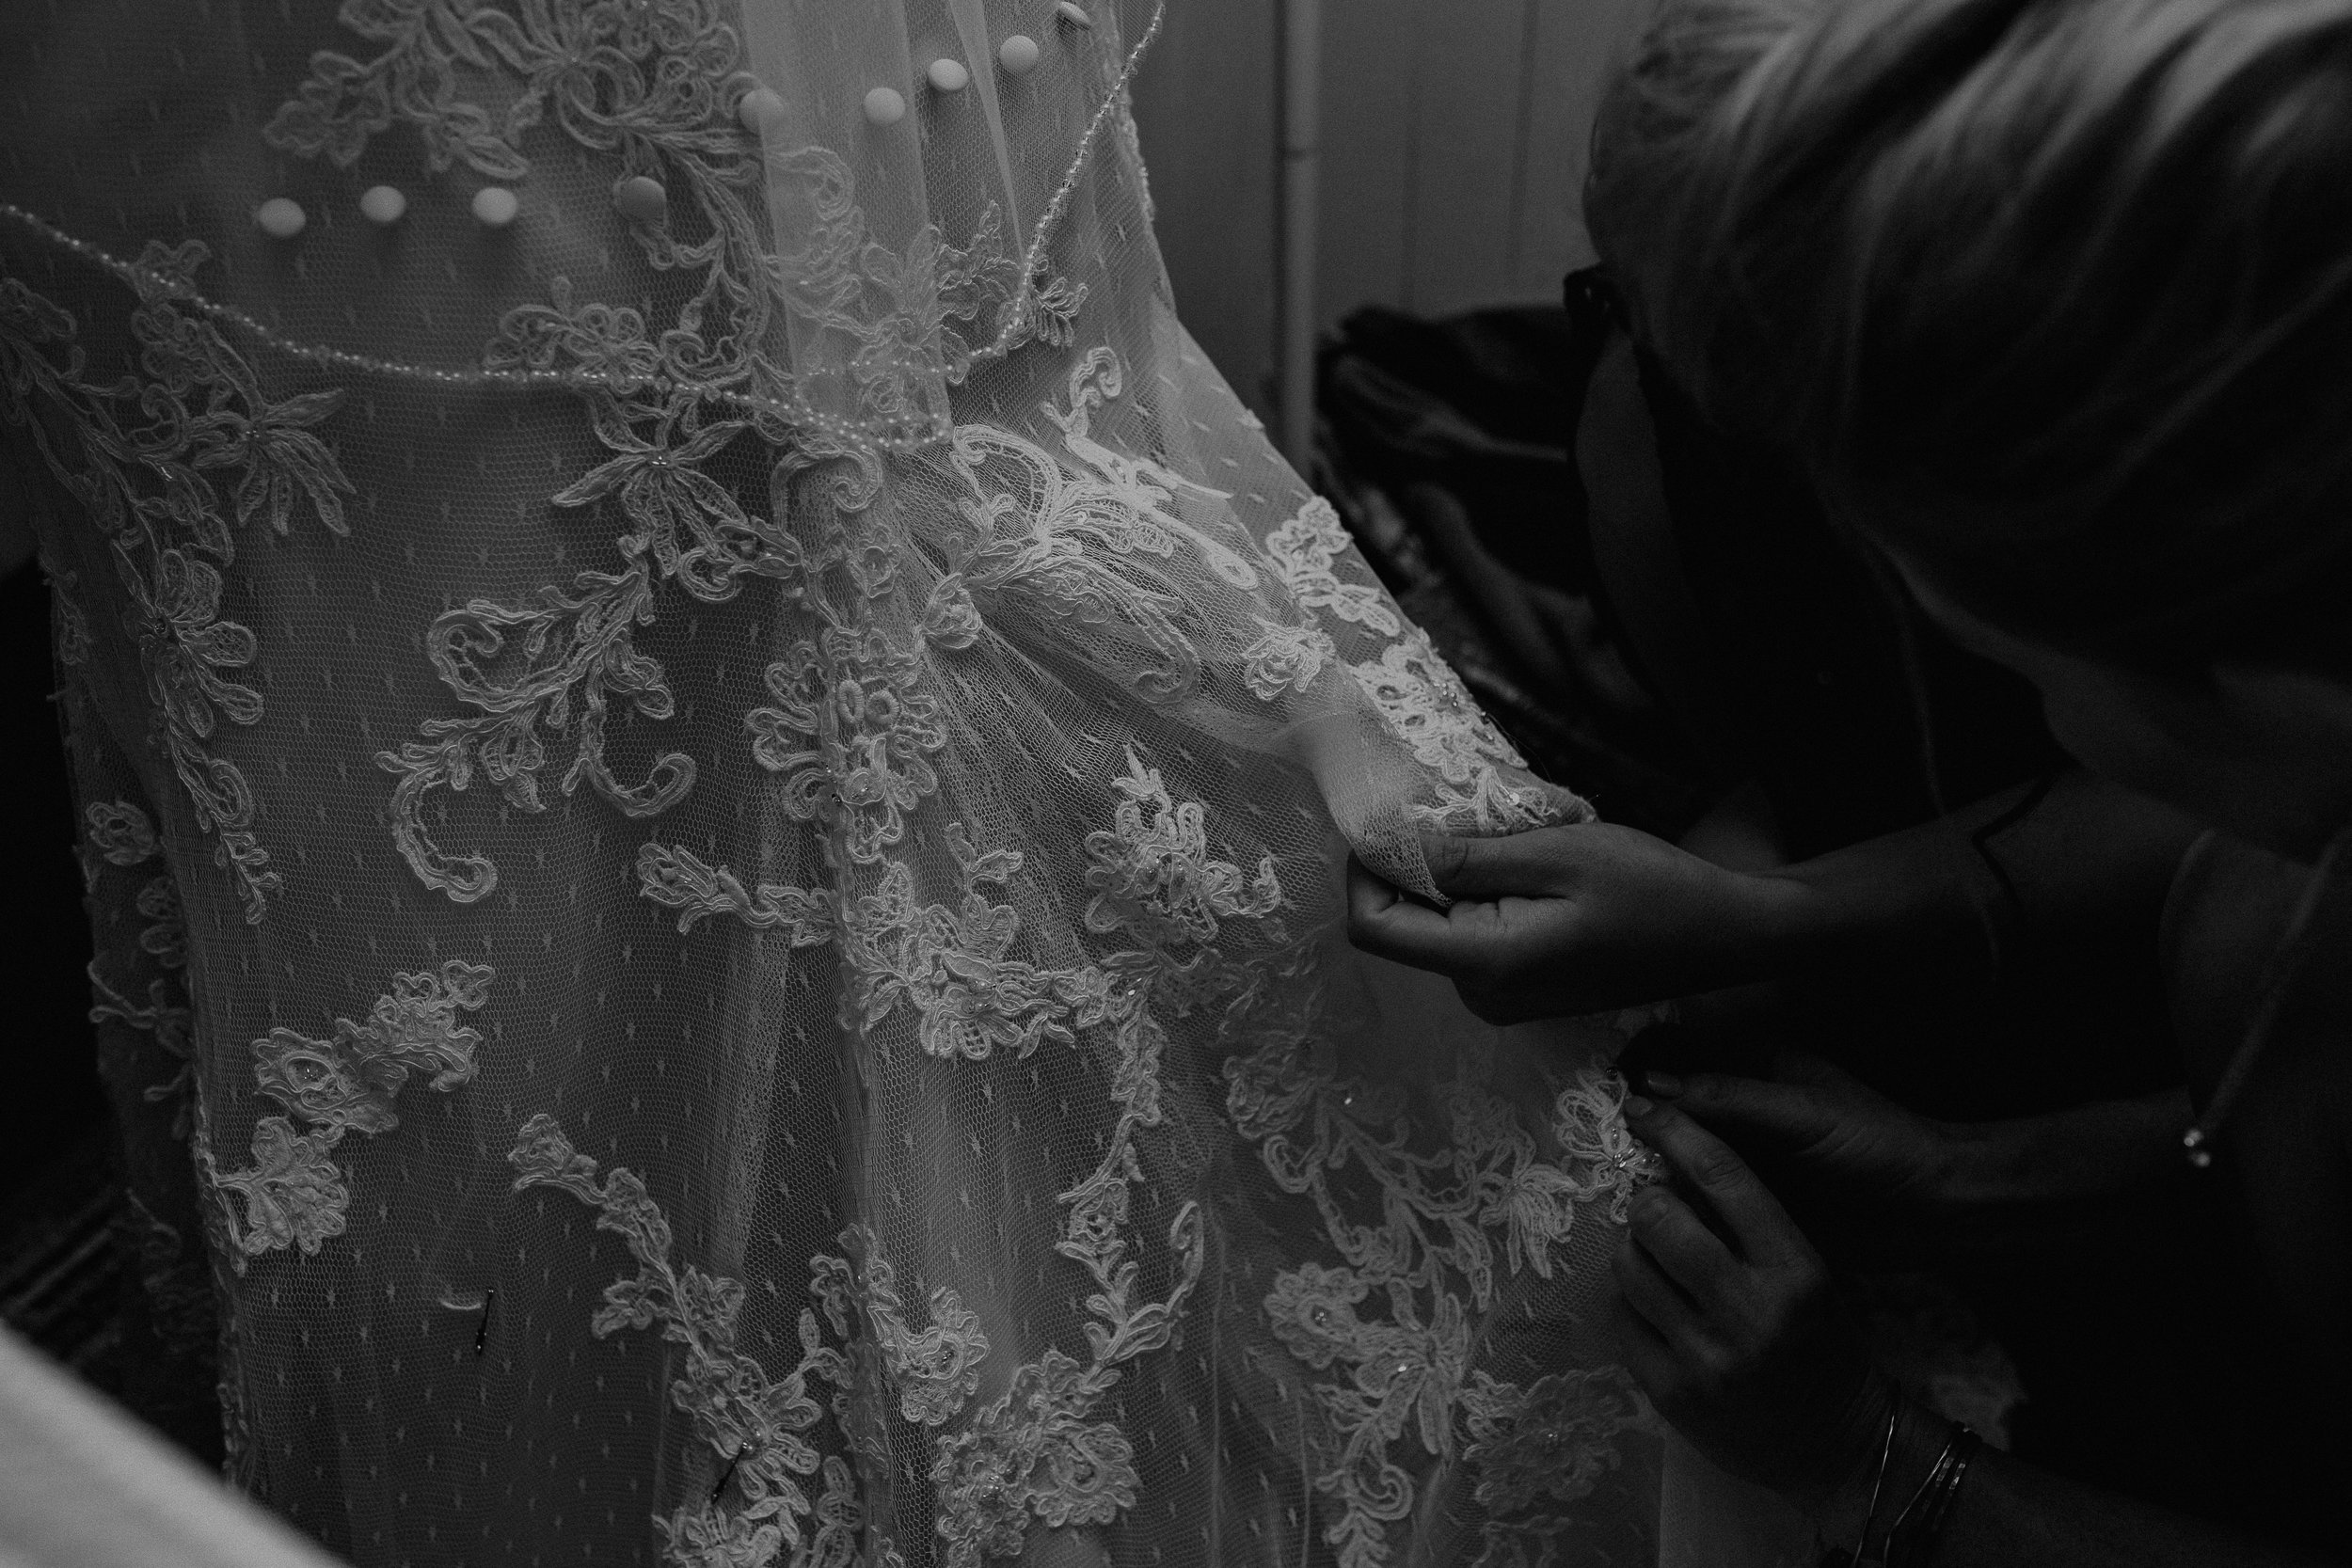 pittsburgh-wedding-photographer-destination-wedding-photography-assateague-island-photographer-3611.jpg